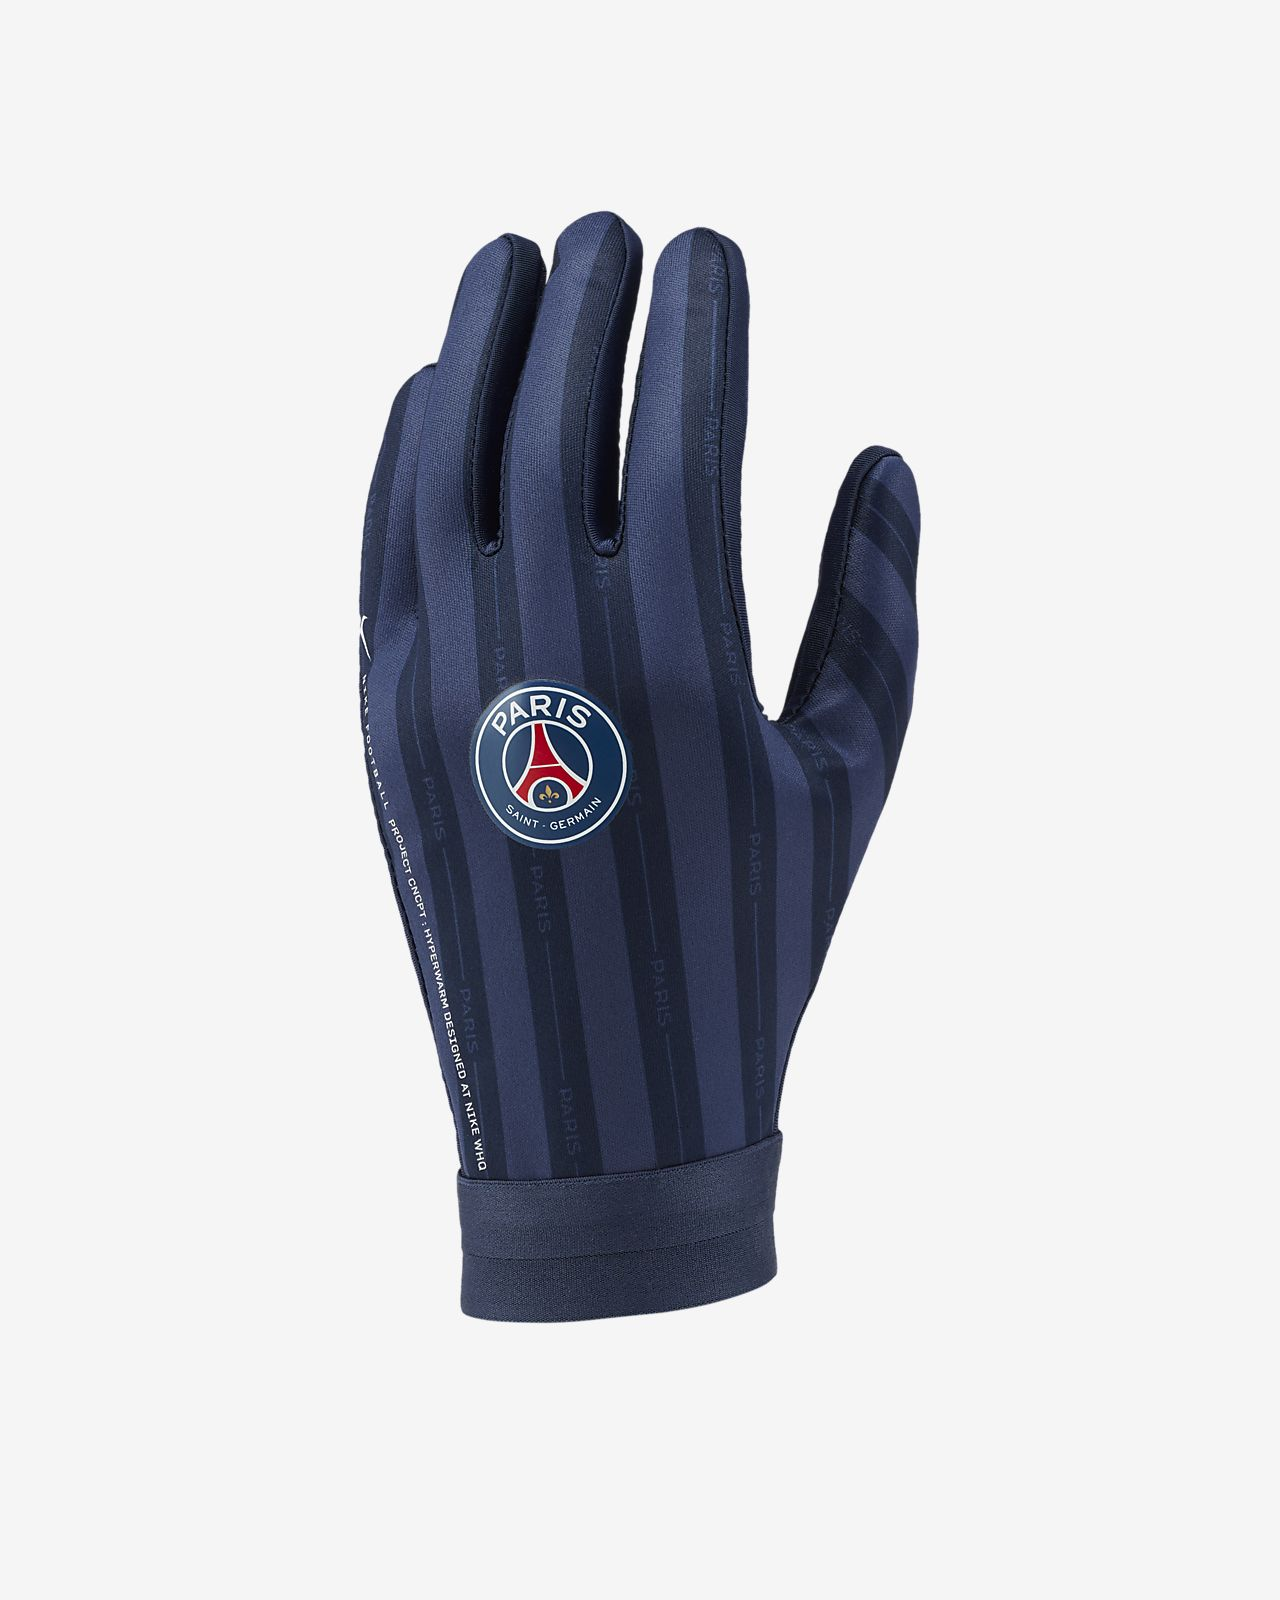 péndulo empleo Hacia atrás  Guantes de fútbol Paris Saint-Germain HyperWarm Academy. Nike CL